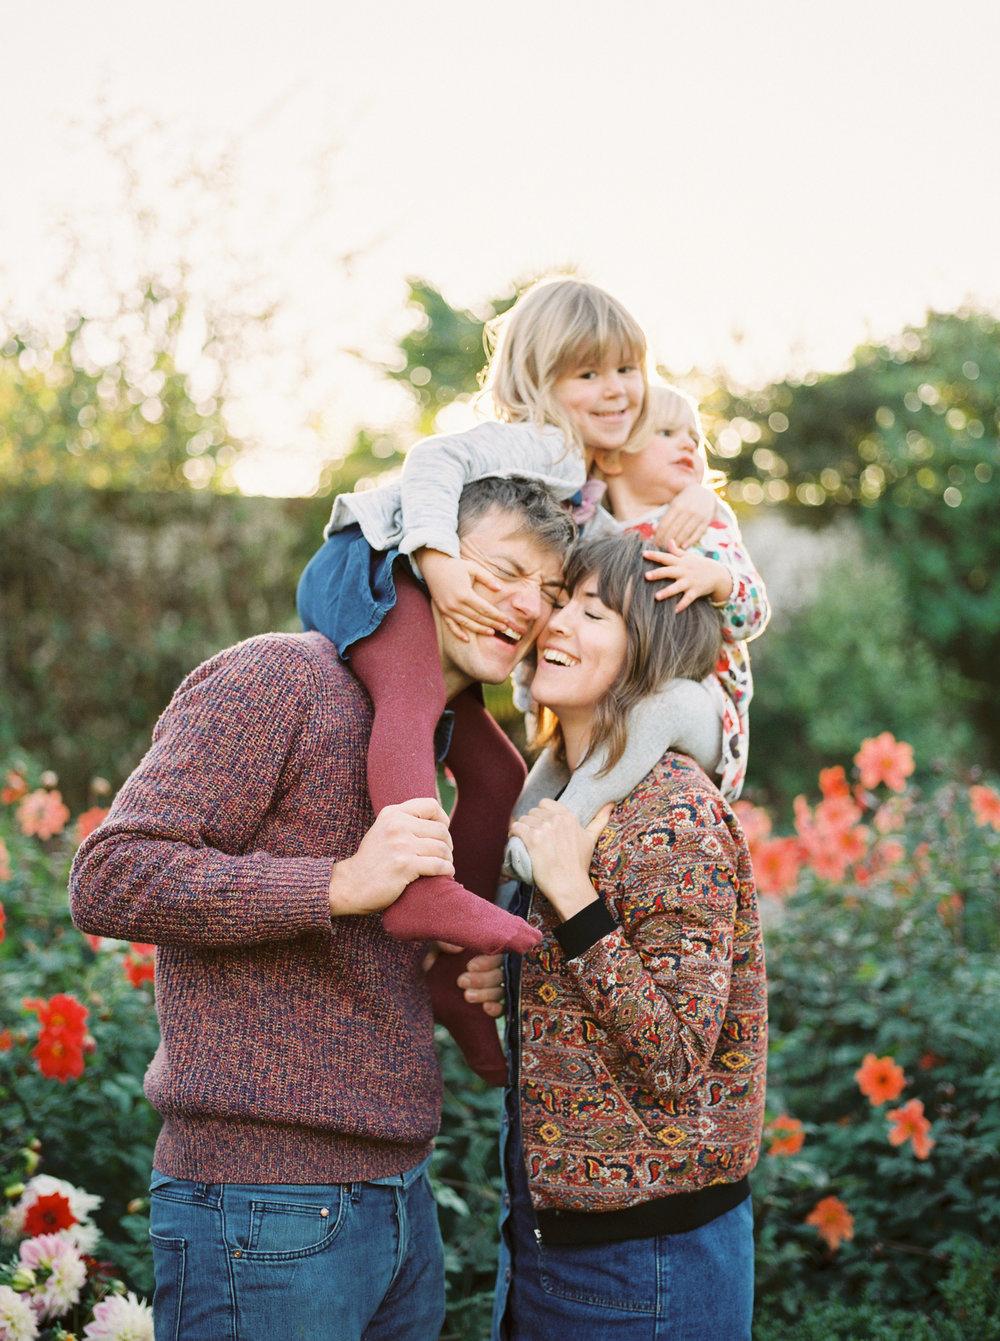 fun and natural family photographer in dorset uk